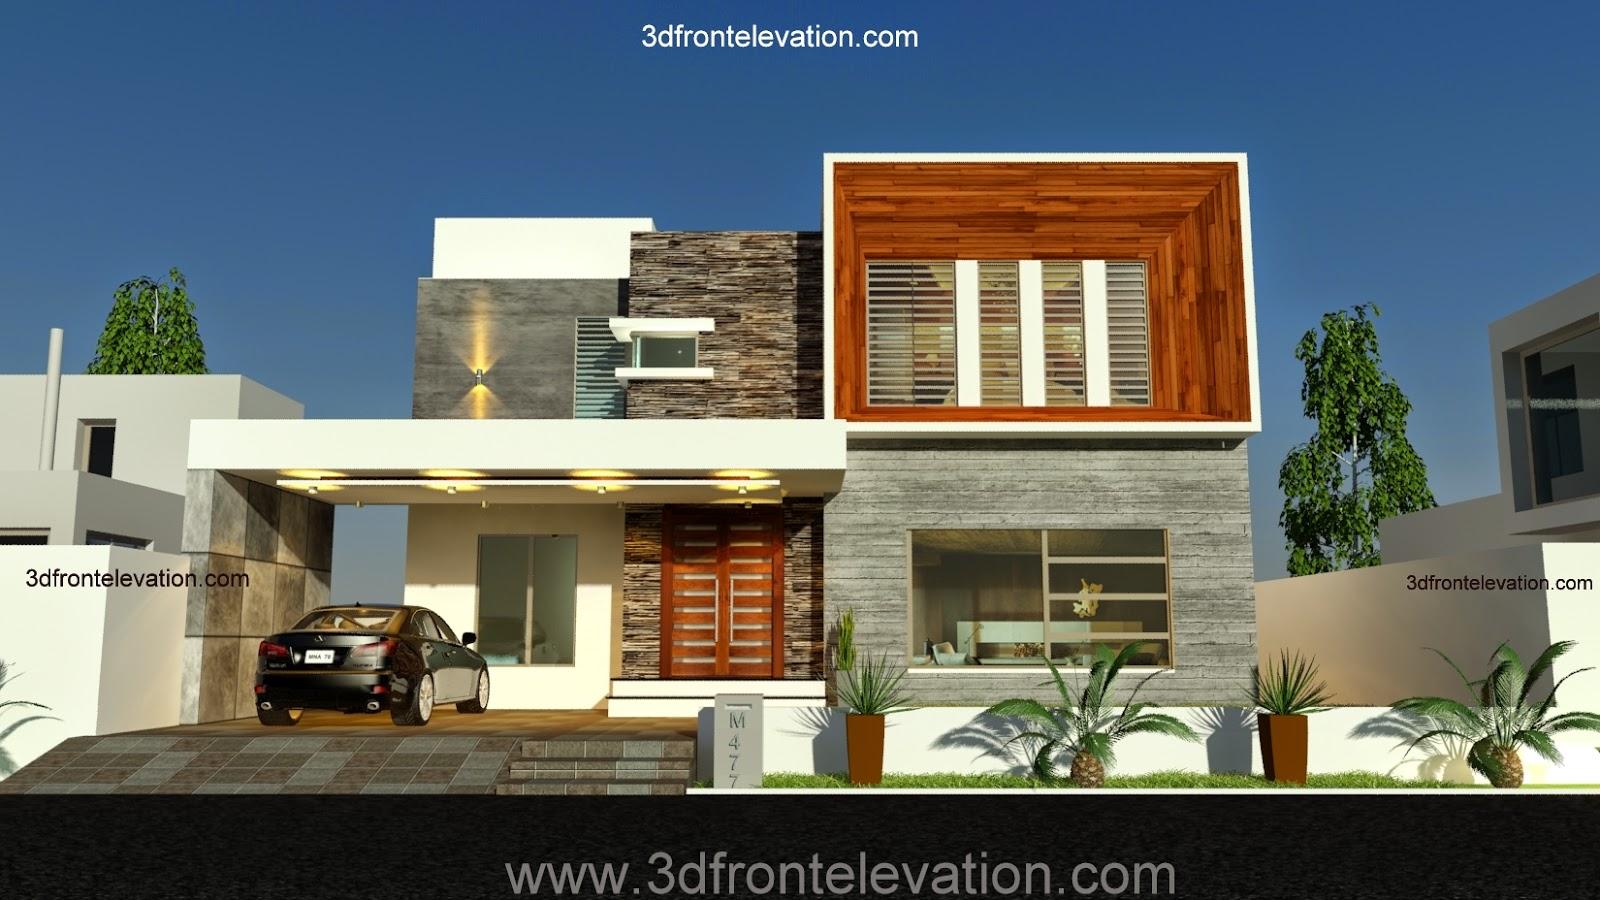 10 Marla House Plans In Pakistan Joy Studio Design